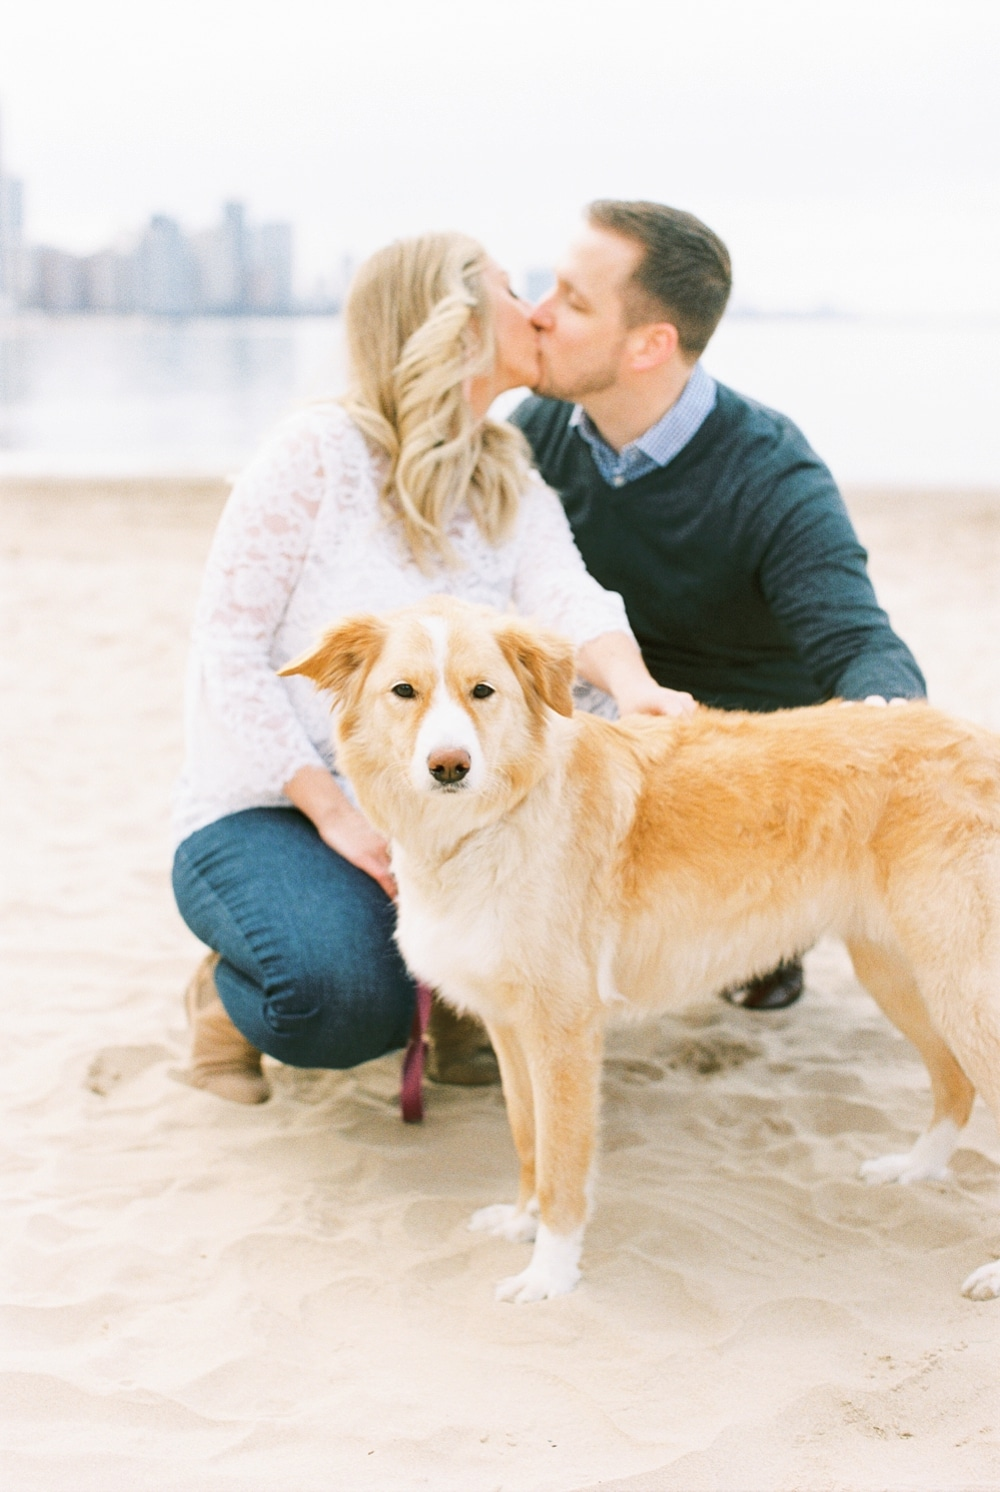 Kristin-La-Voie-Photography-Chicago-Wedding-Photographer-2